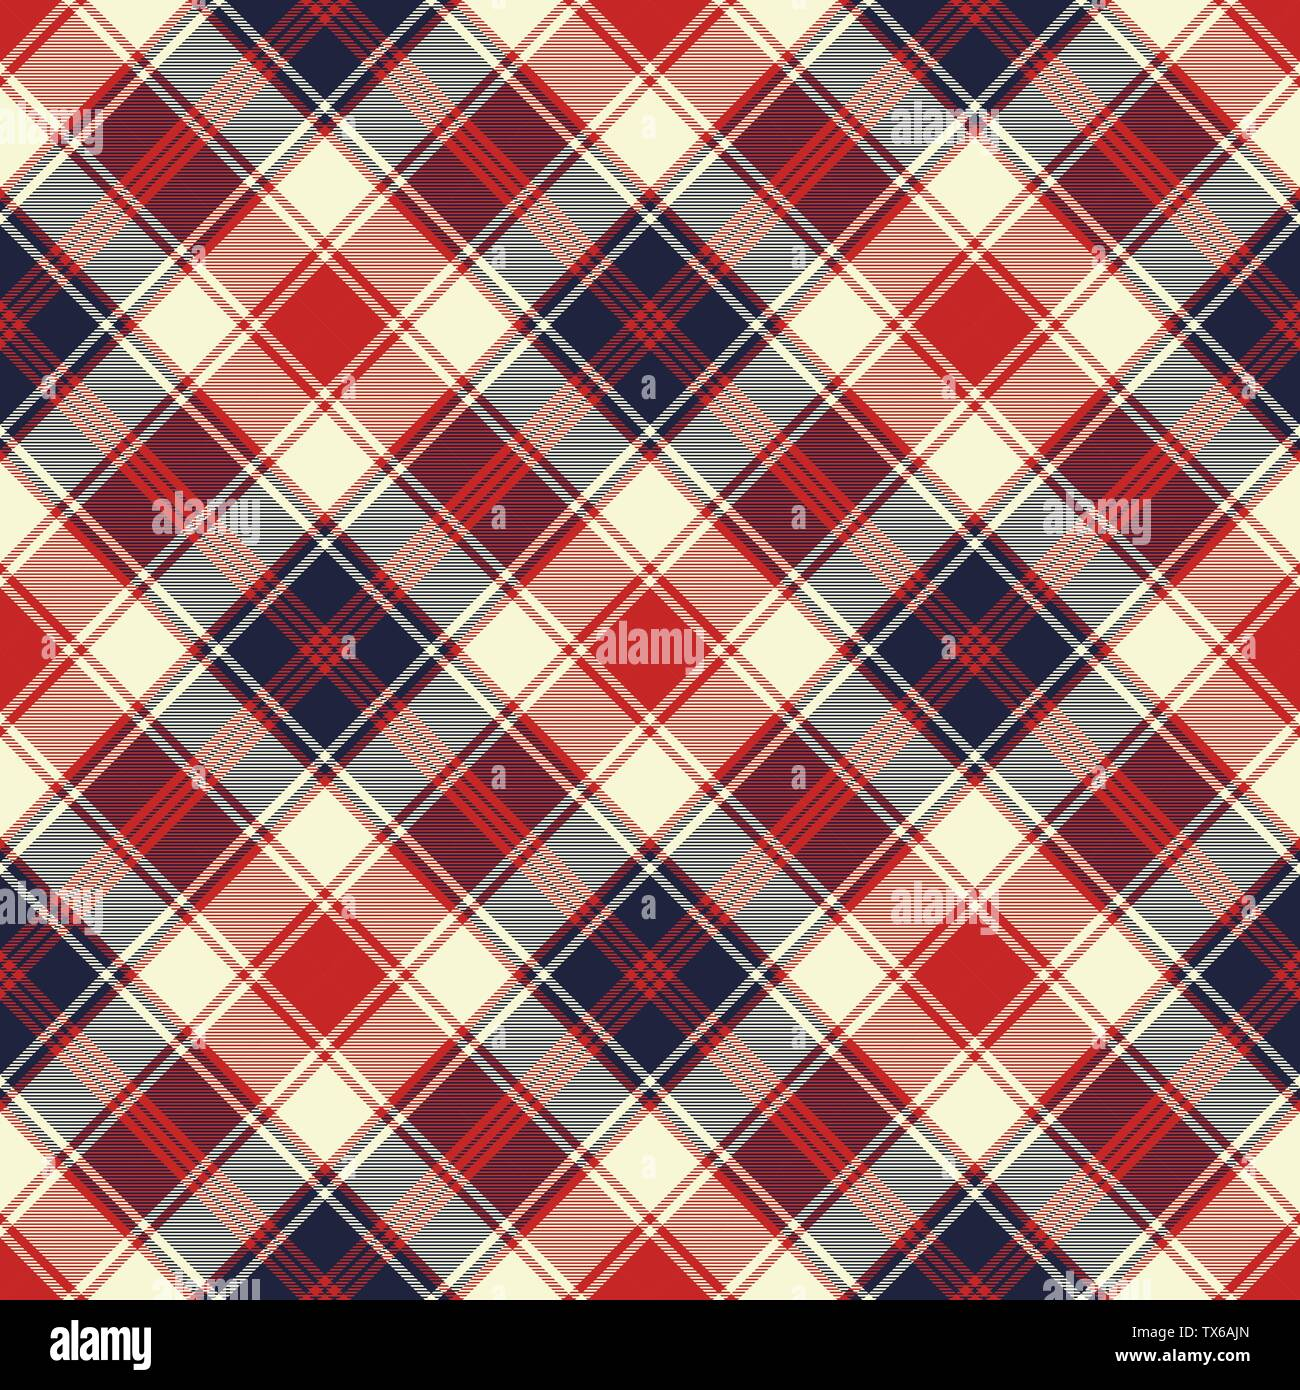 Plaid check diagonal fabric texture seamless pattern. Vector illustration. - Stock Vector